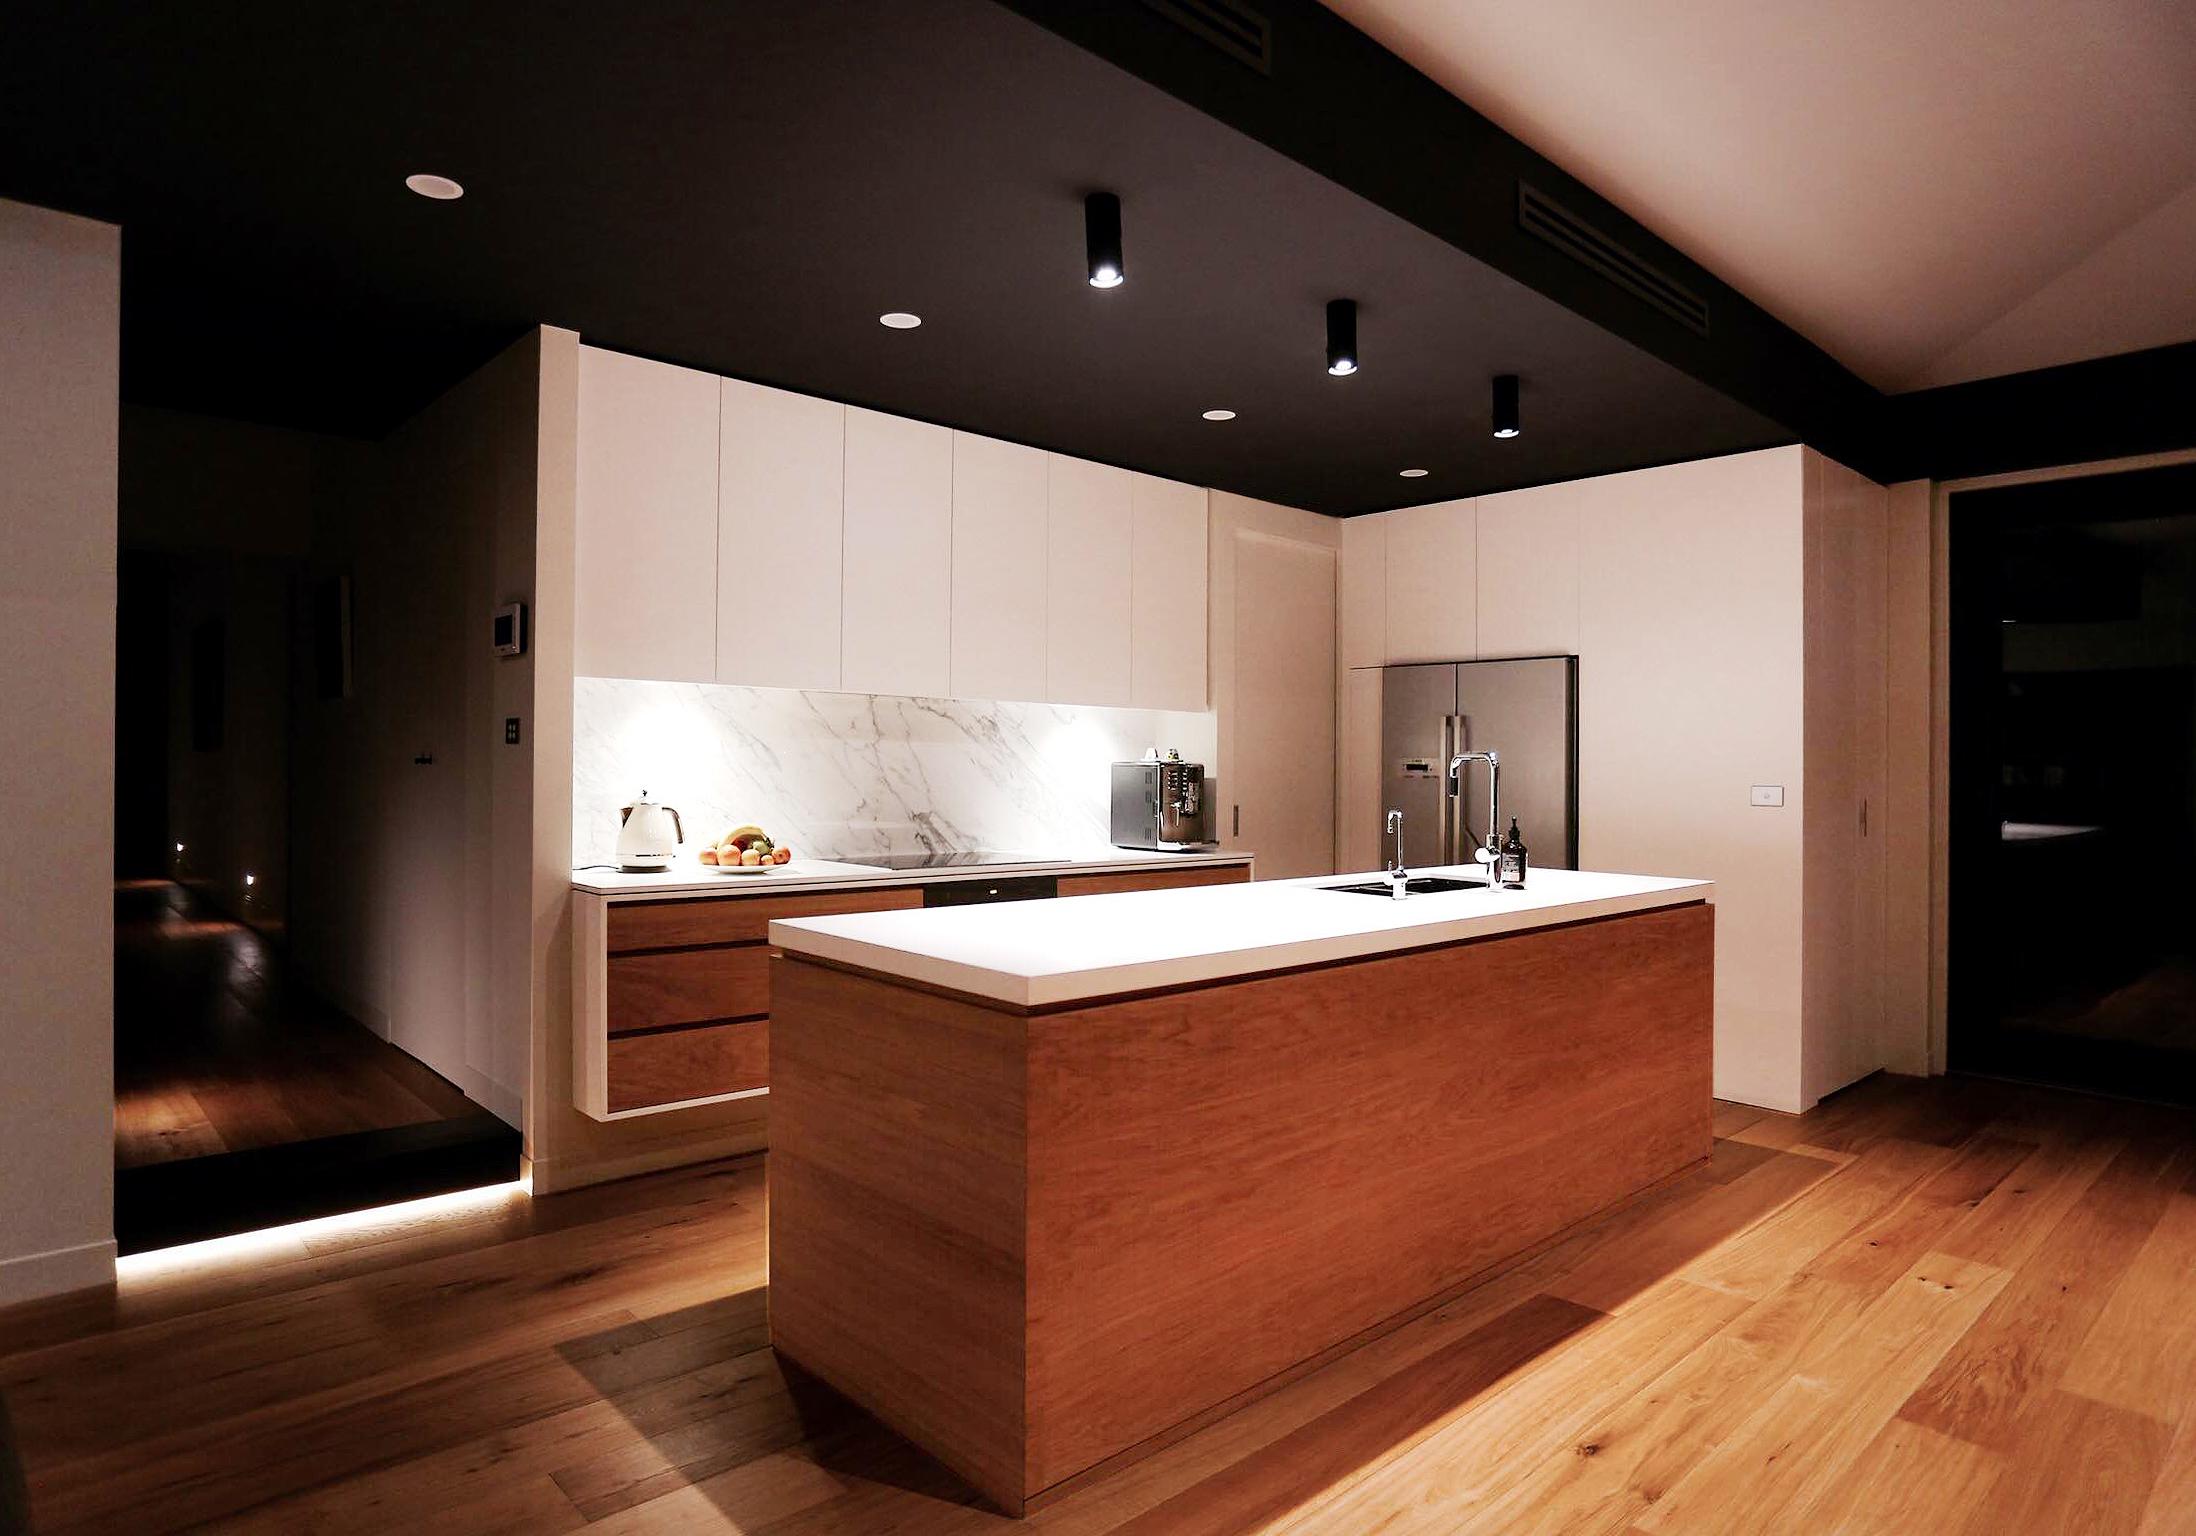 Crocker Street House By Moloney Architects (via Lunchbox Architect)